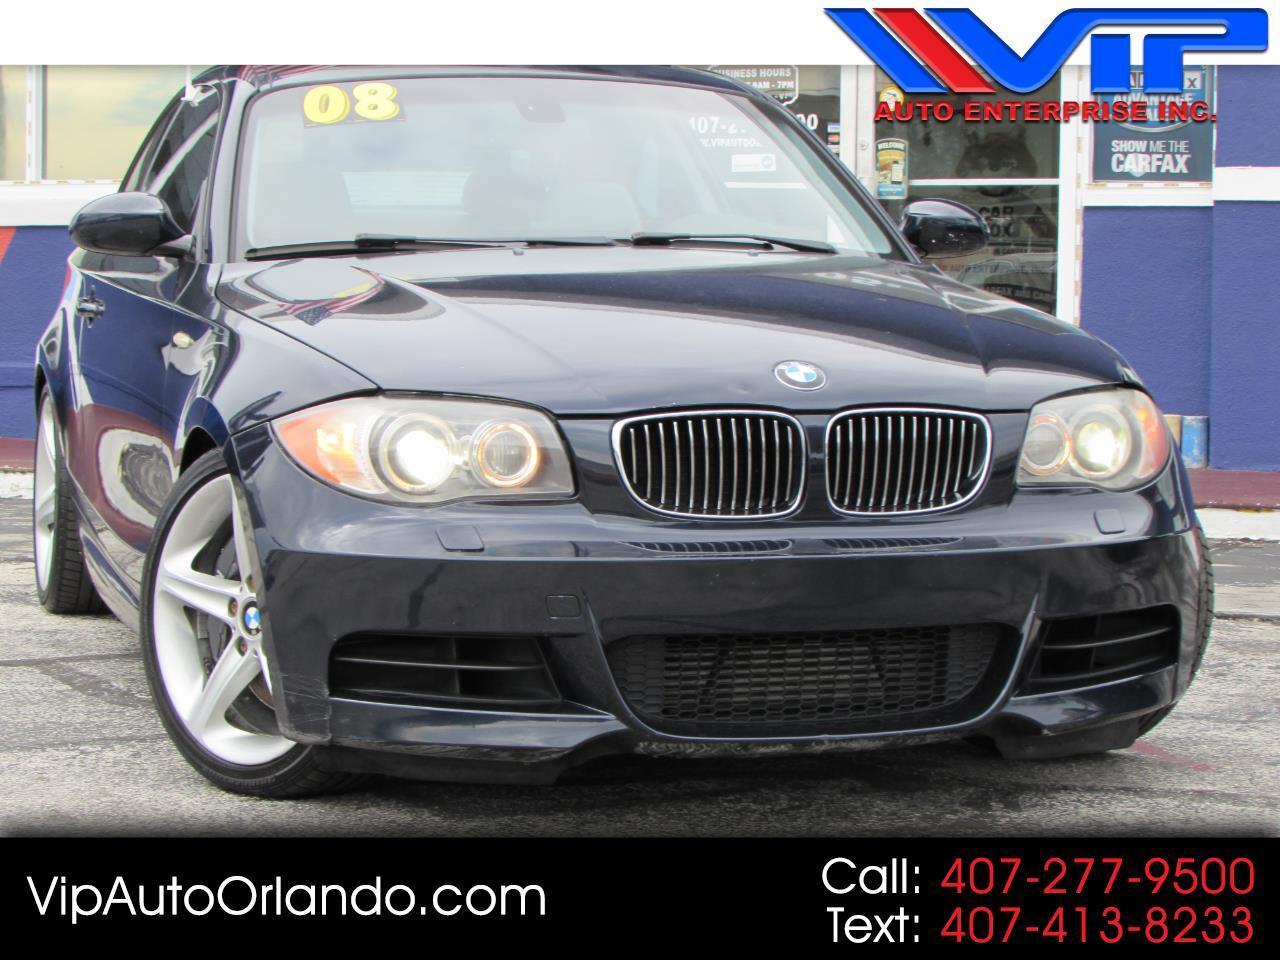 2008 BMW 1 Series 2dr Cpe 135i